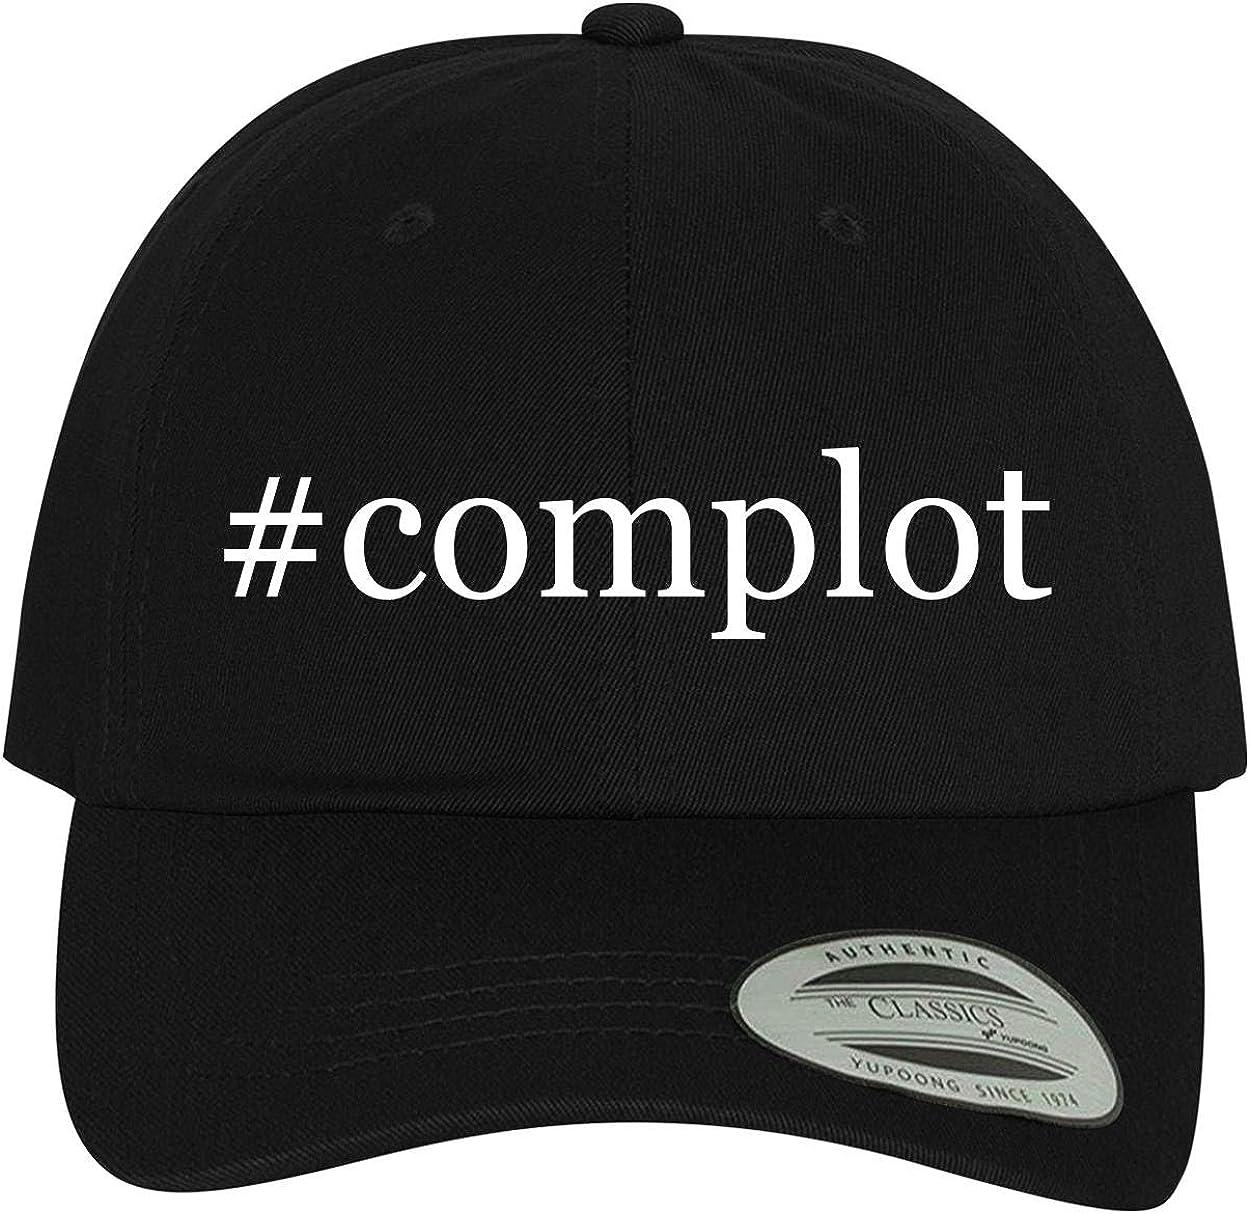 Comfortable Dad Hat Baseball Cap BH Cool Designs #Complot